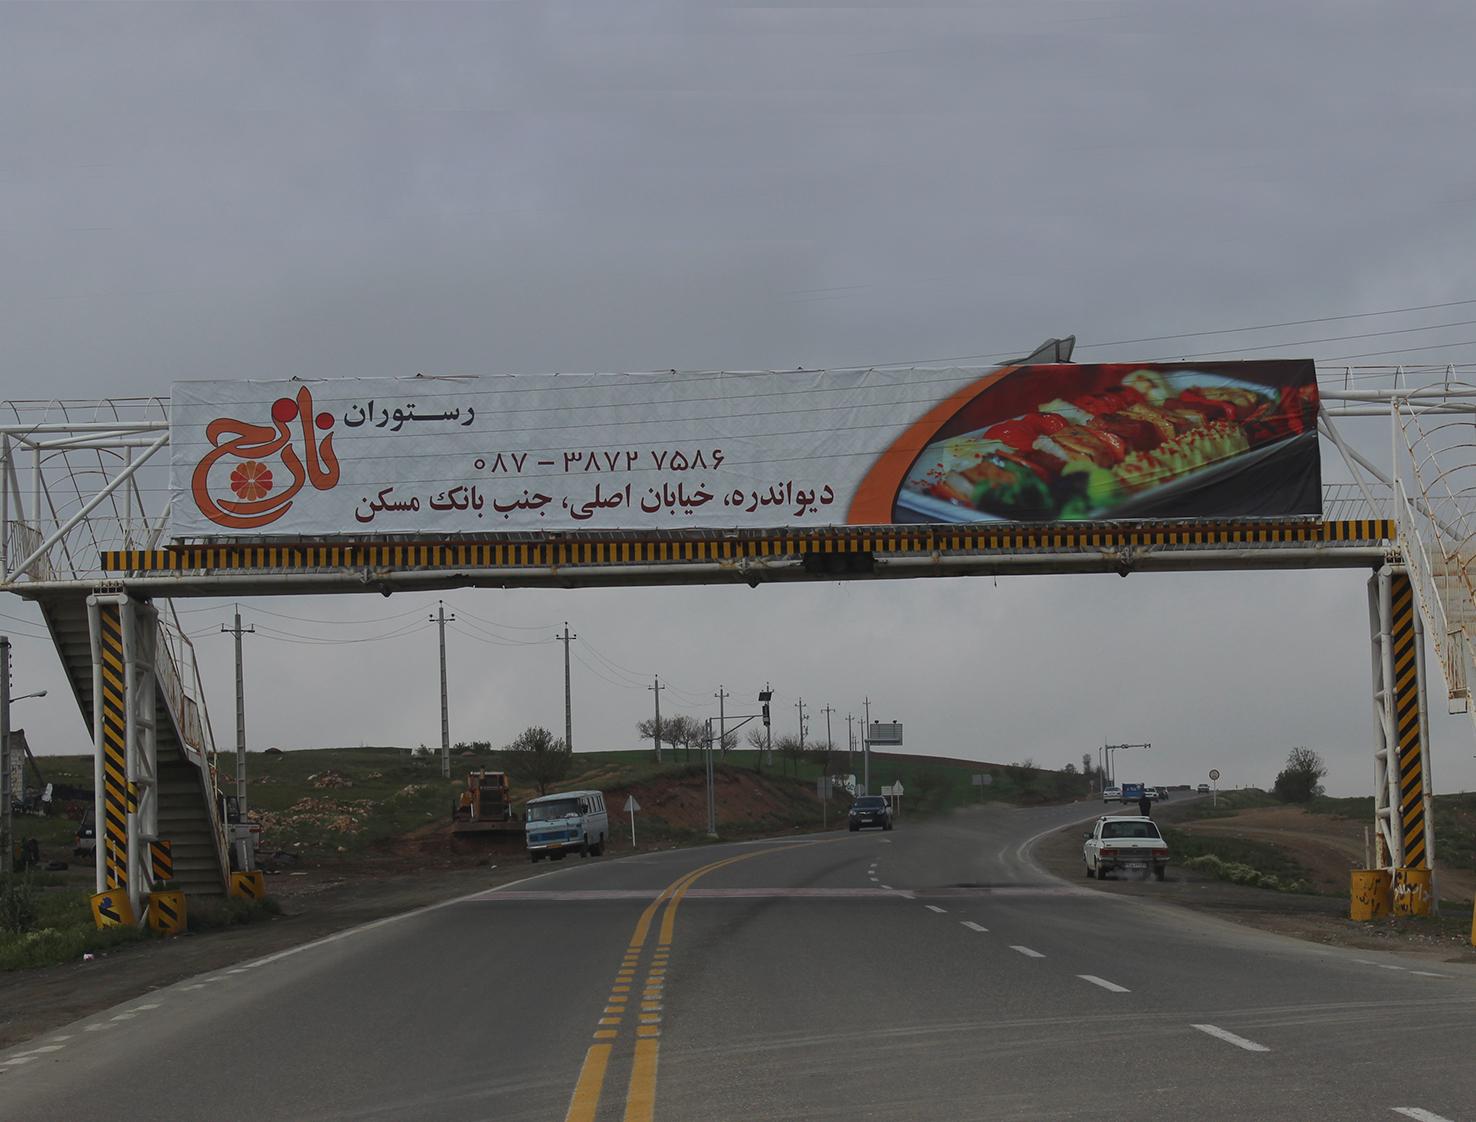 بیلبورد تبلیغاتی محور سقز دیواندره ، پل عابر پیاده رشید آباد